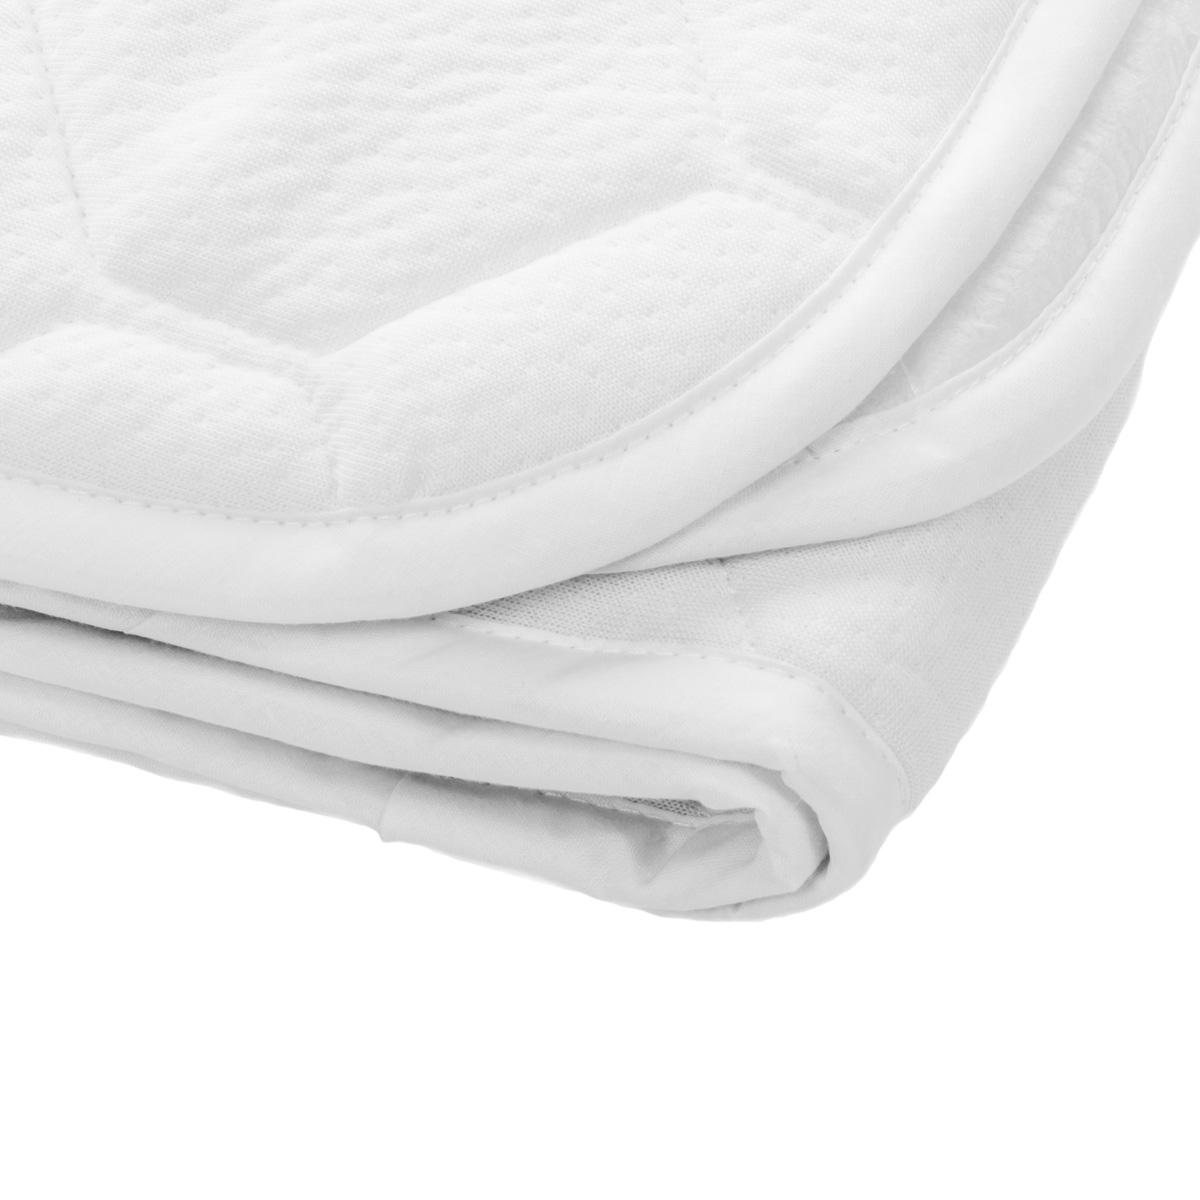 Protectie igienica saltea HP1 120/60 cm